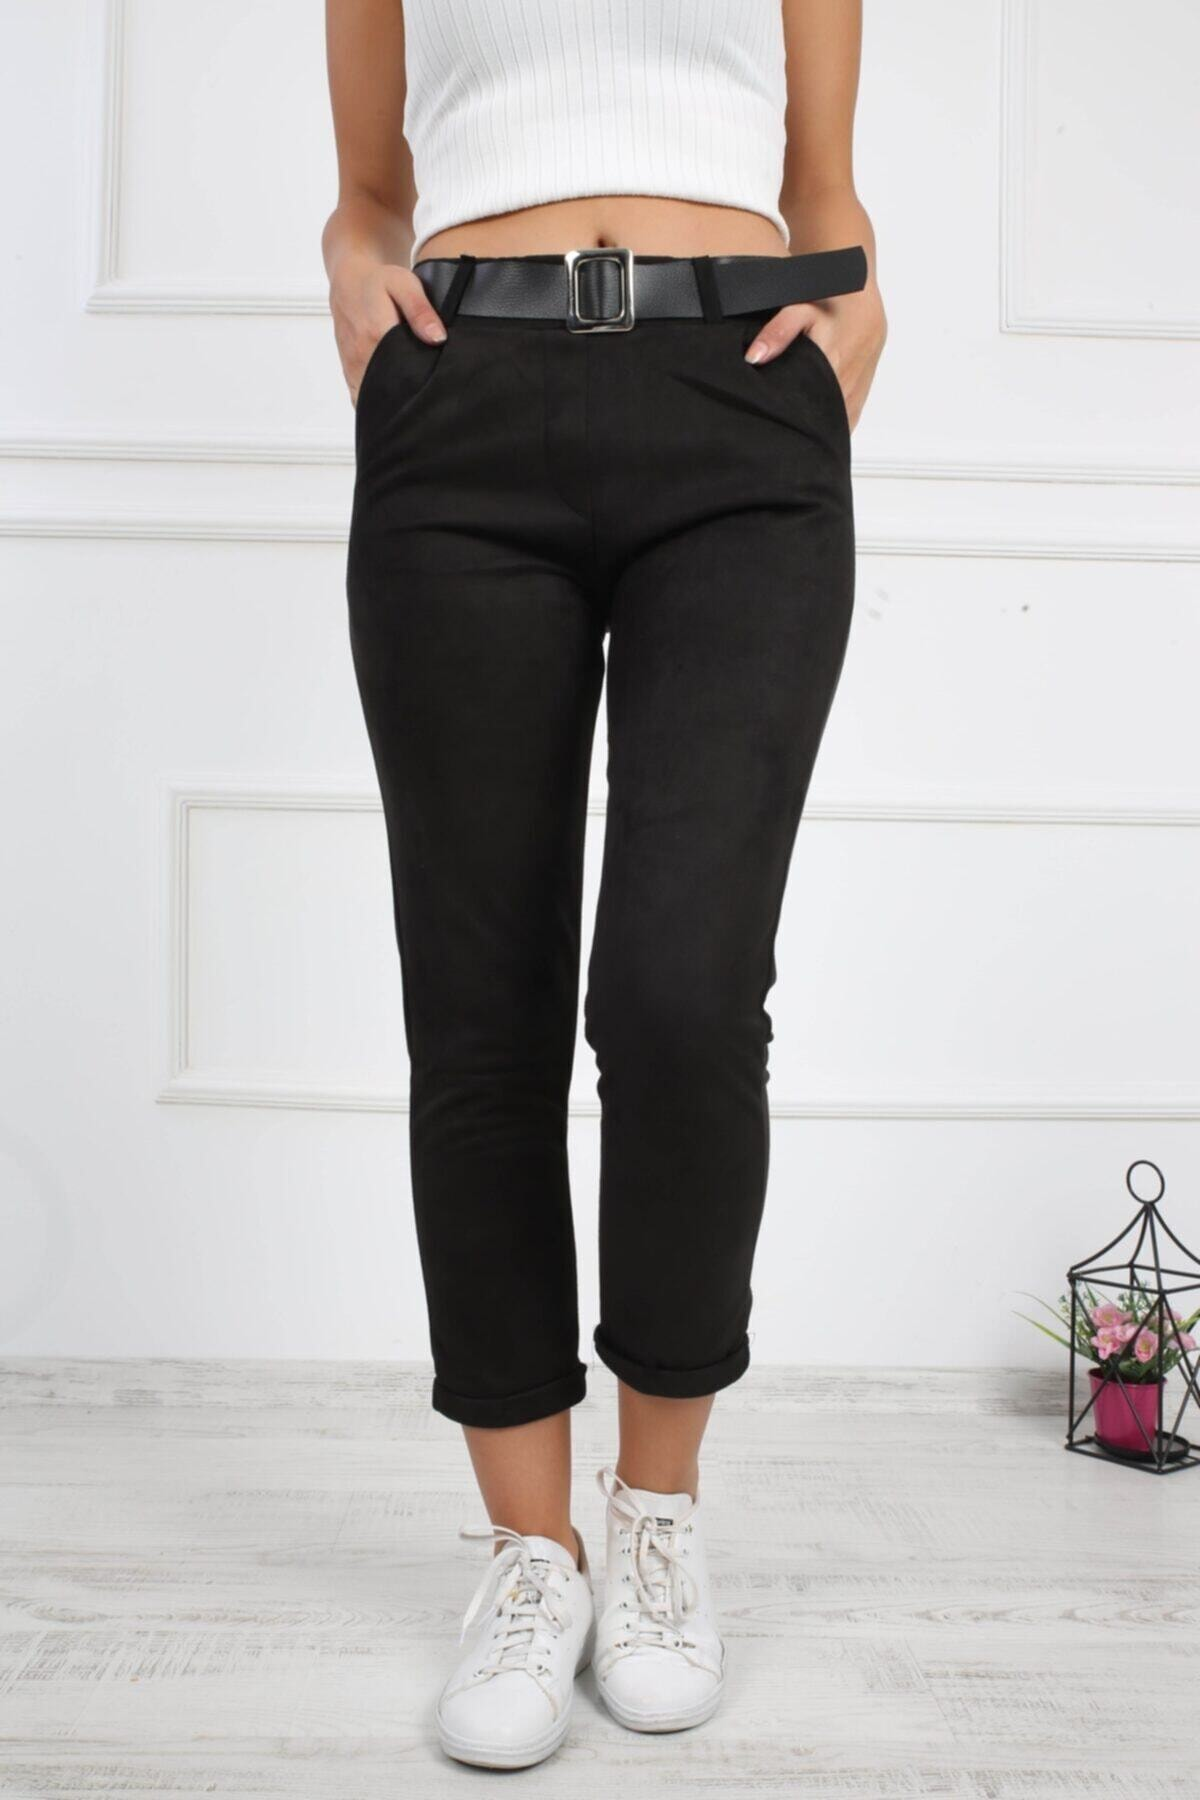 Prenses Tayt Kadın Siyah Duble Paça Süet Pantolon 424 1